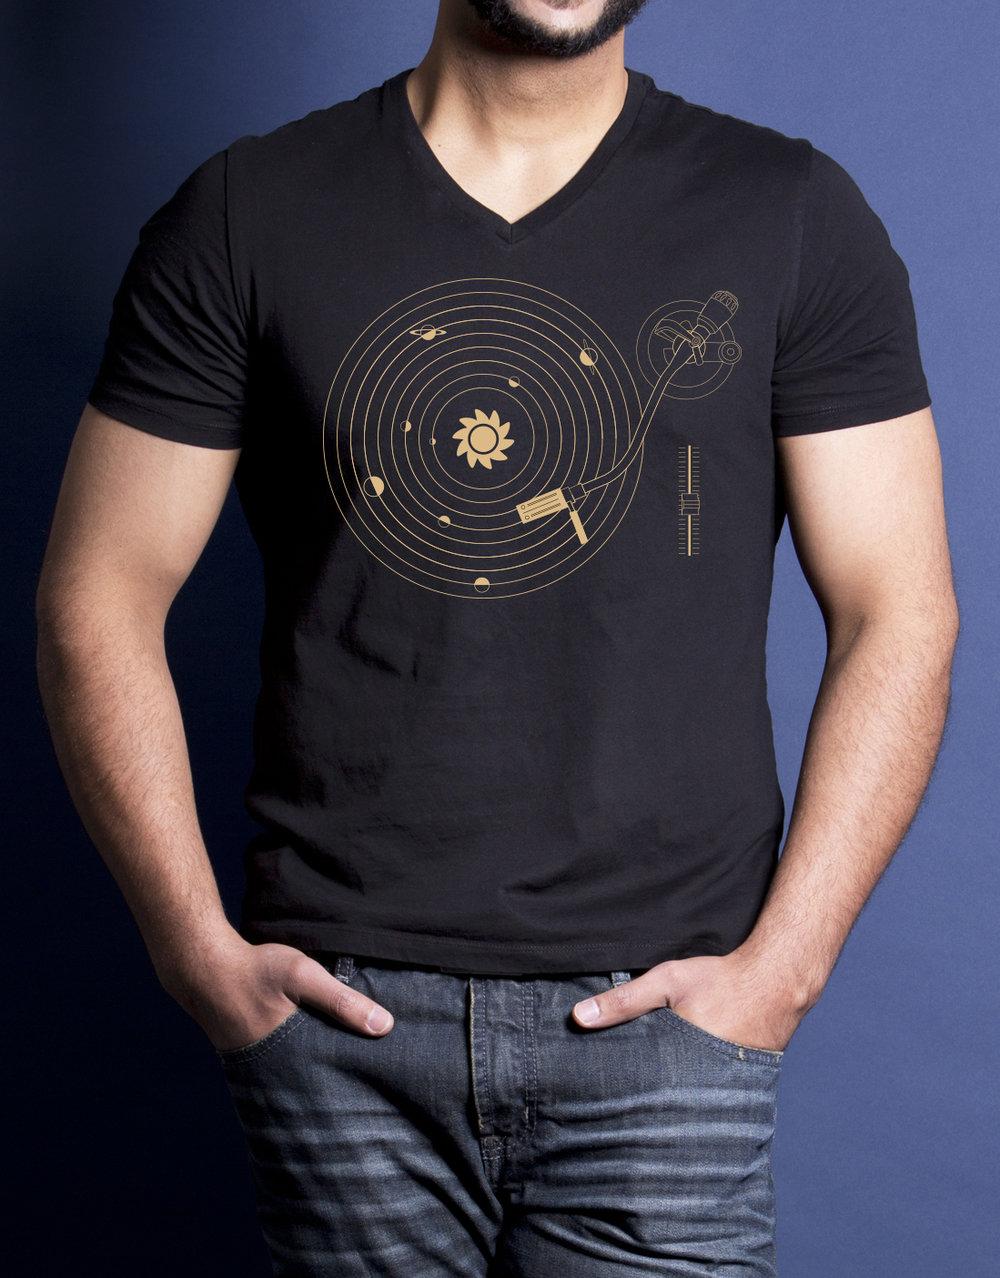 vinyl-solar-system-kyle-dolan-design-illustration-tshirt.jpg